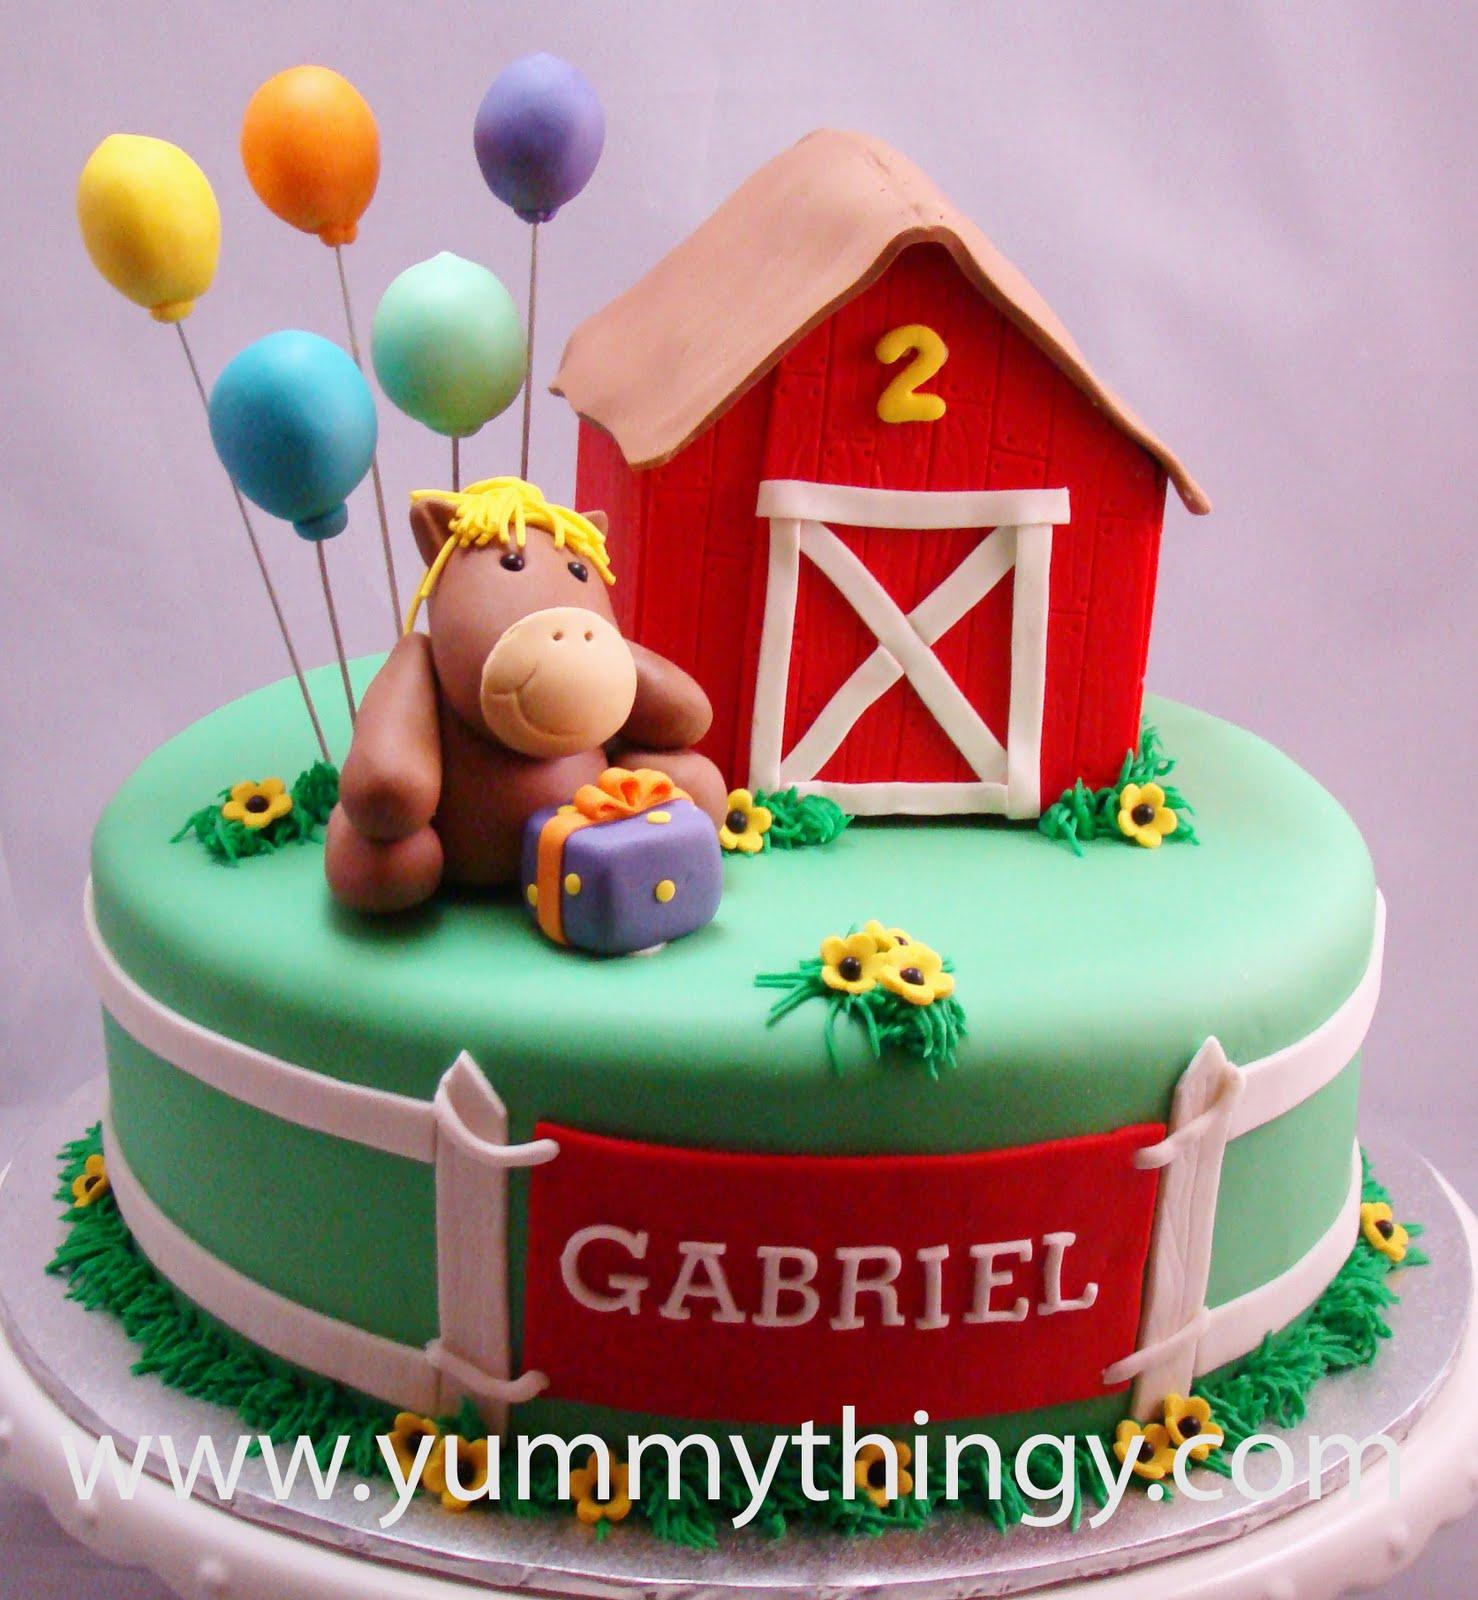 Yummy Thingy: Farm Theme Cake